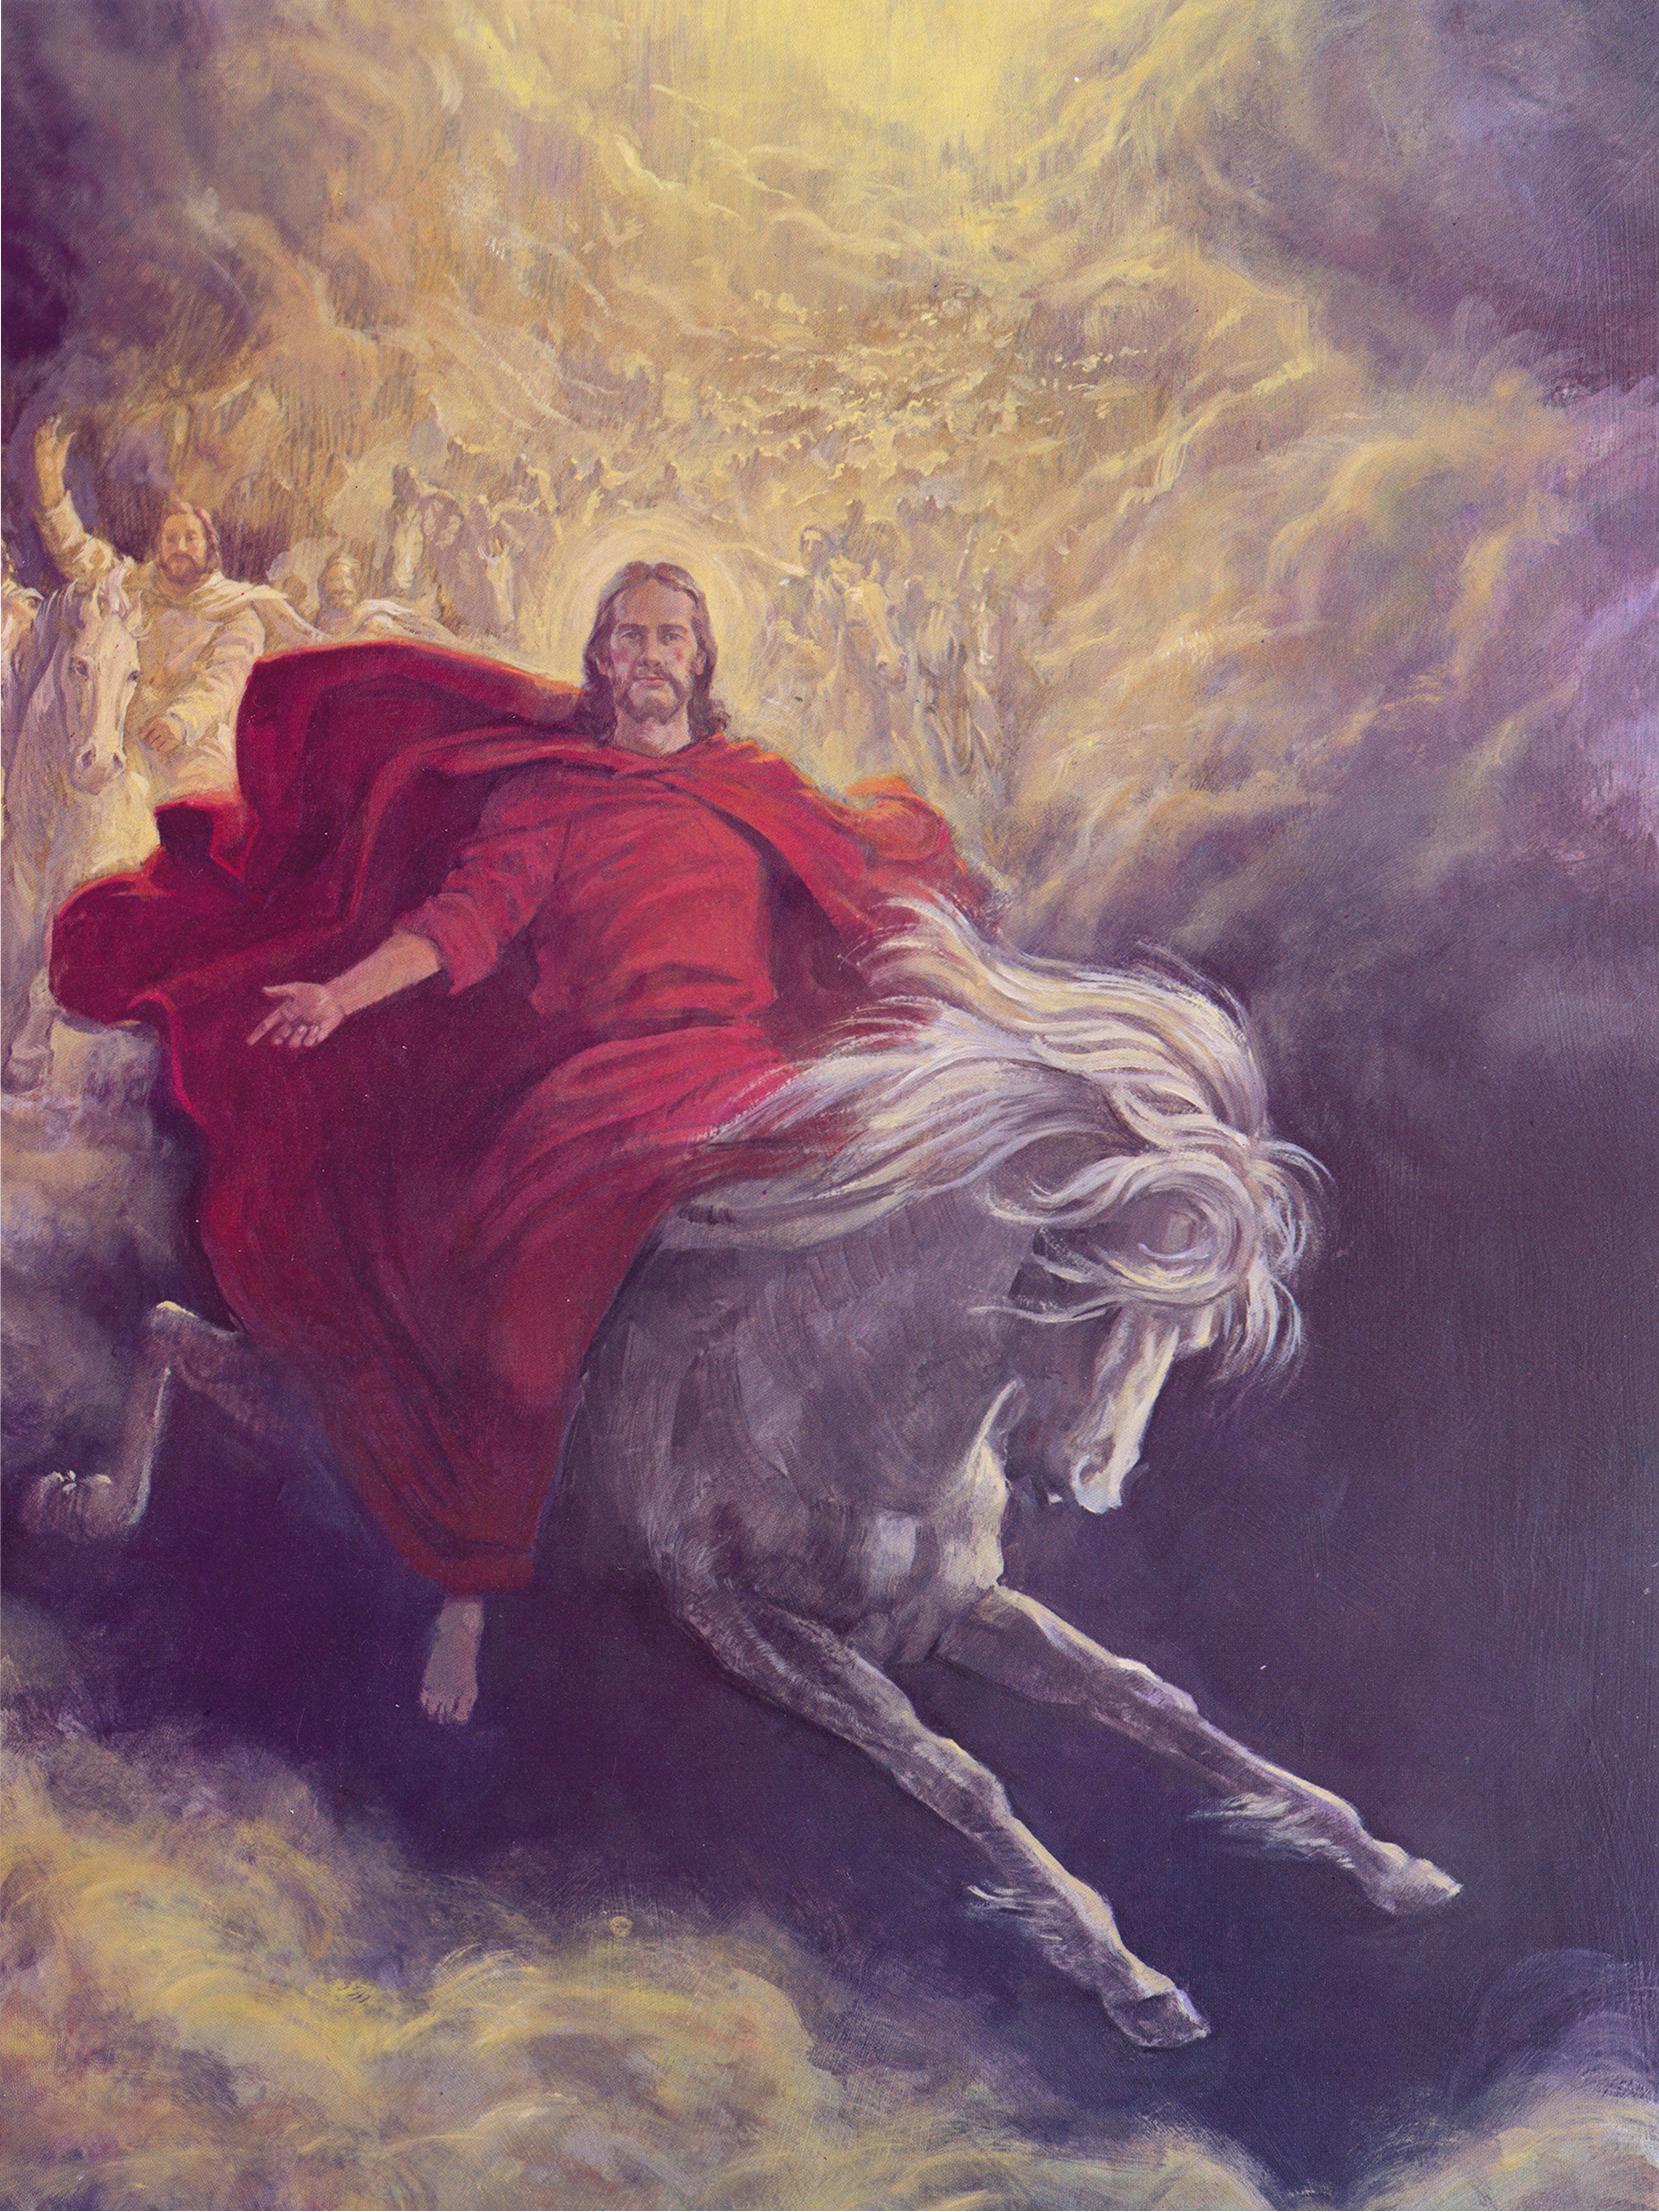 Jesus Second coming